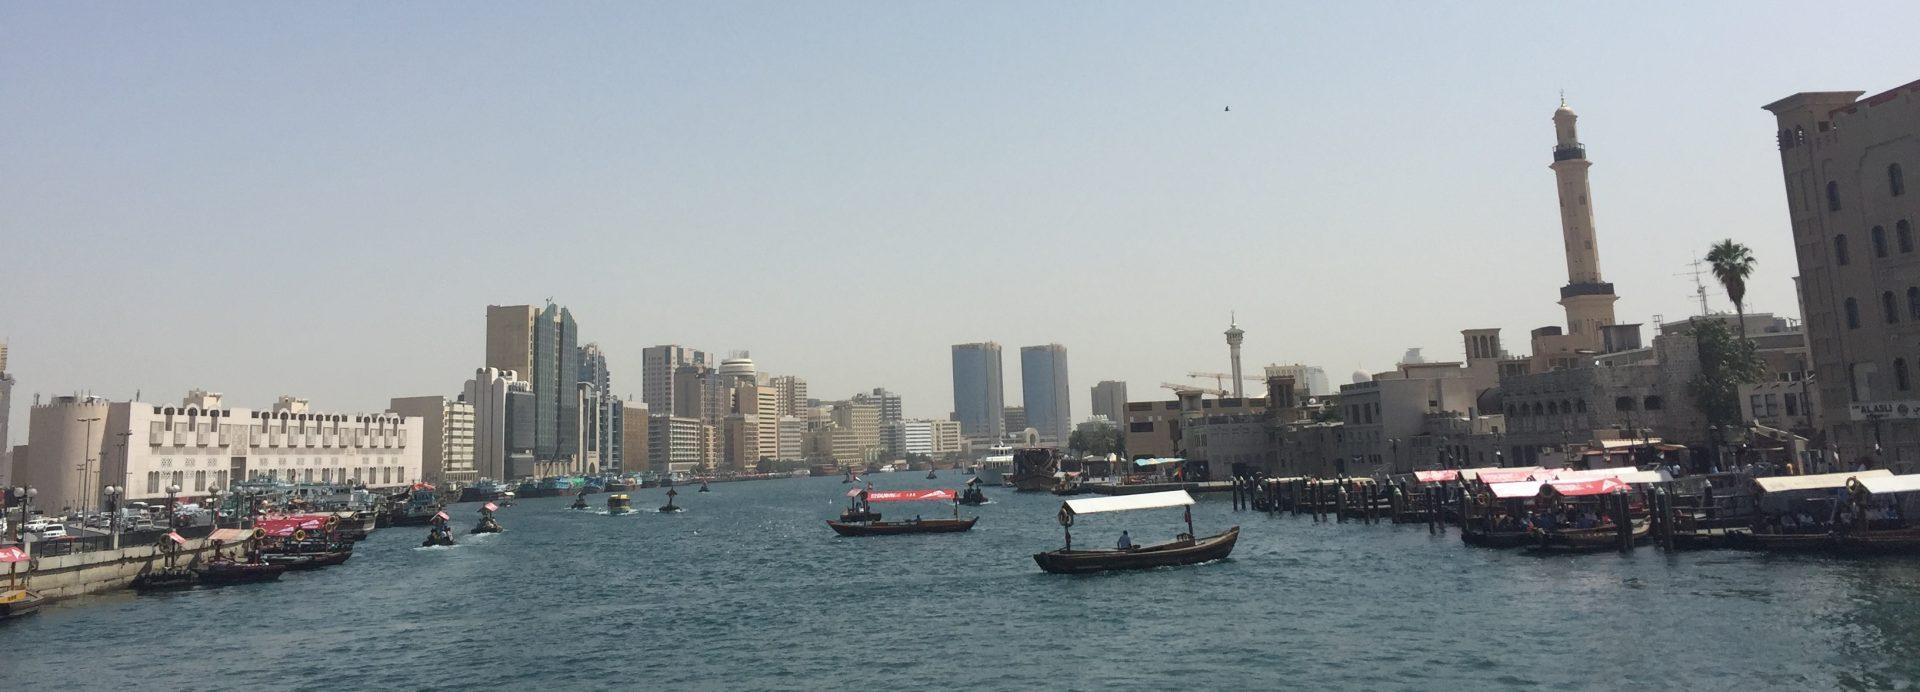 Viajar sola a Dubai 7.jpg